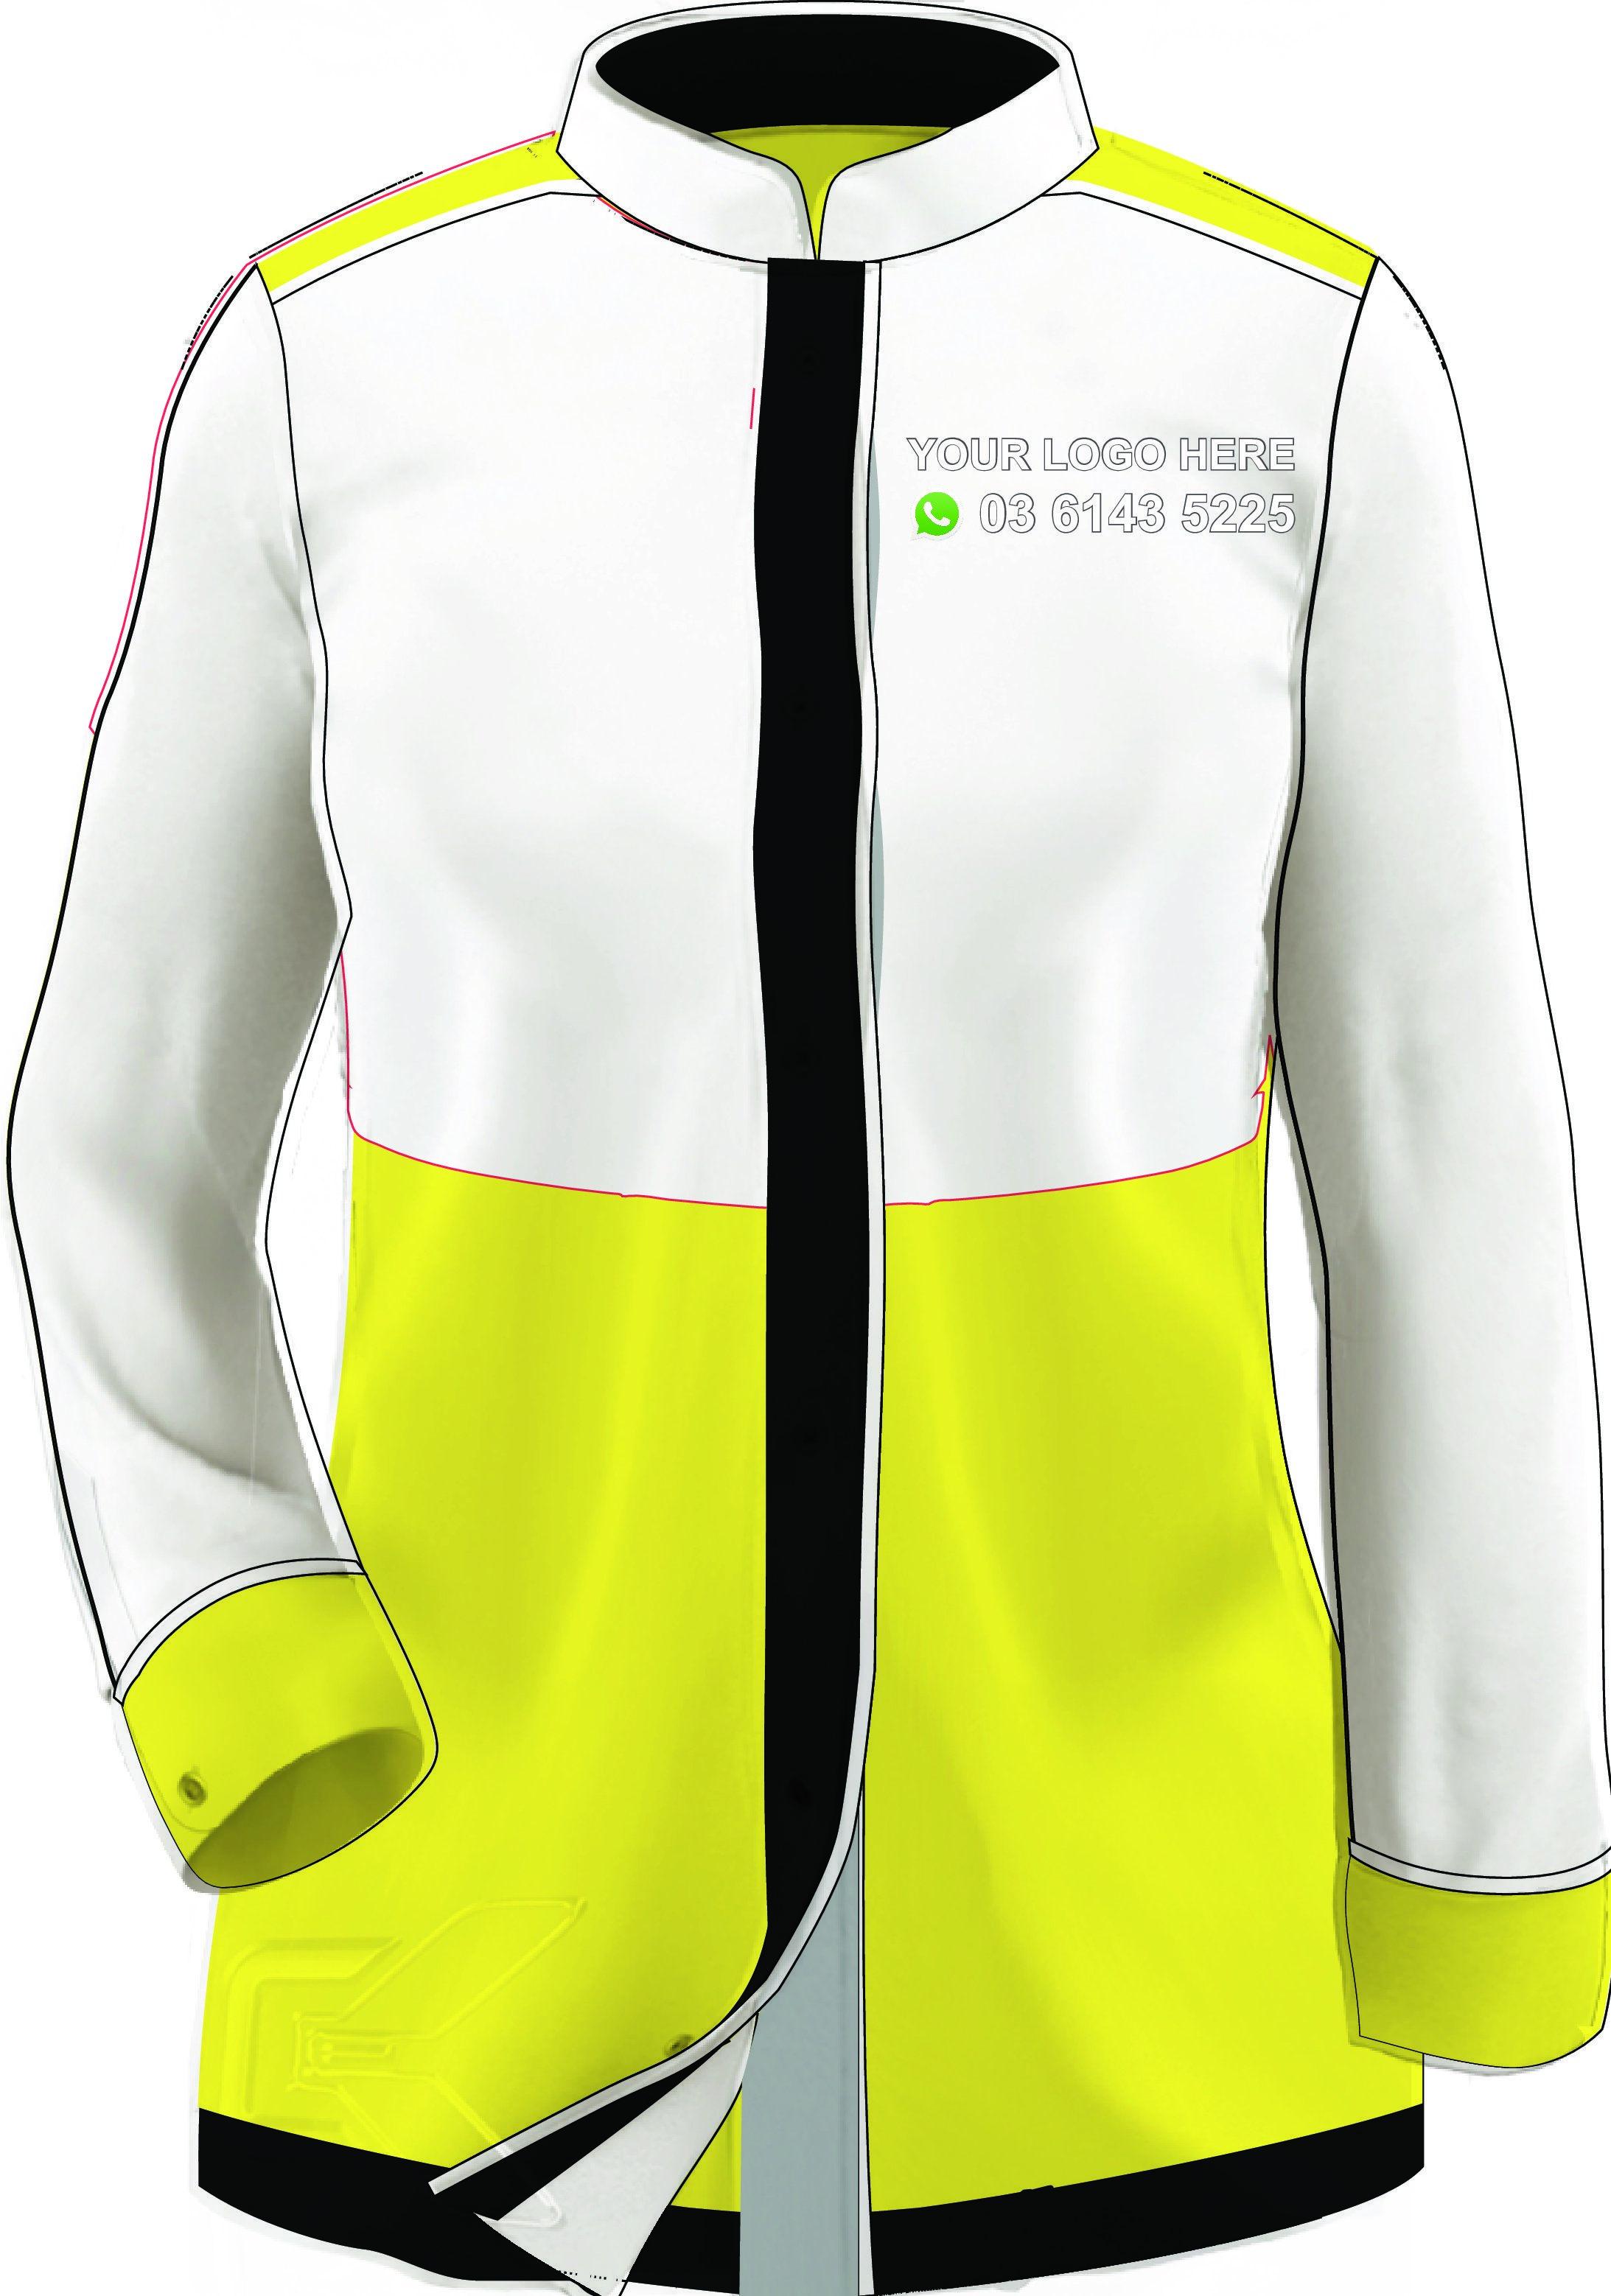 Baju Korporat Lelaki Uniforms Whatsapp Us 0103425700 Fadzil Aripin Ladies Blouse Designs Corporate Shirts Corporate Uniforms